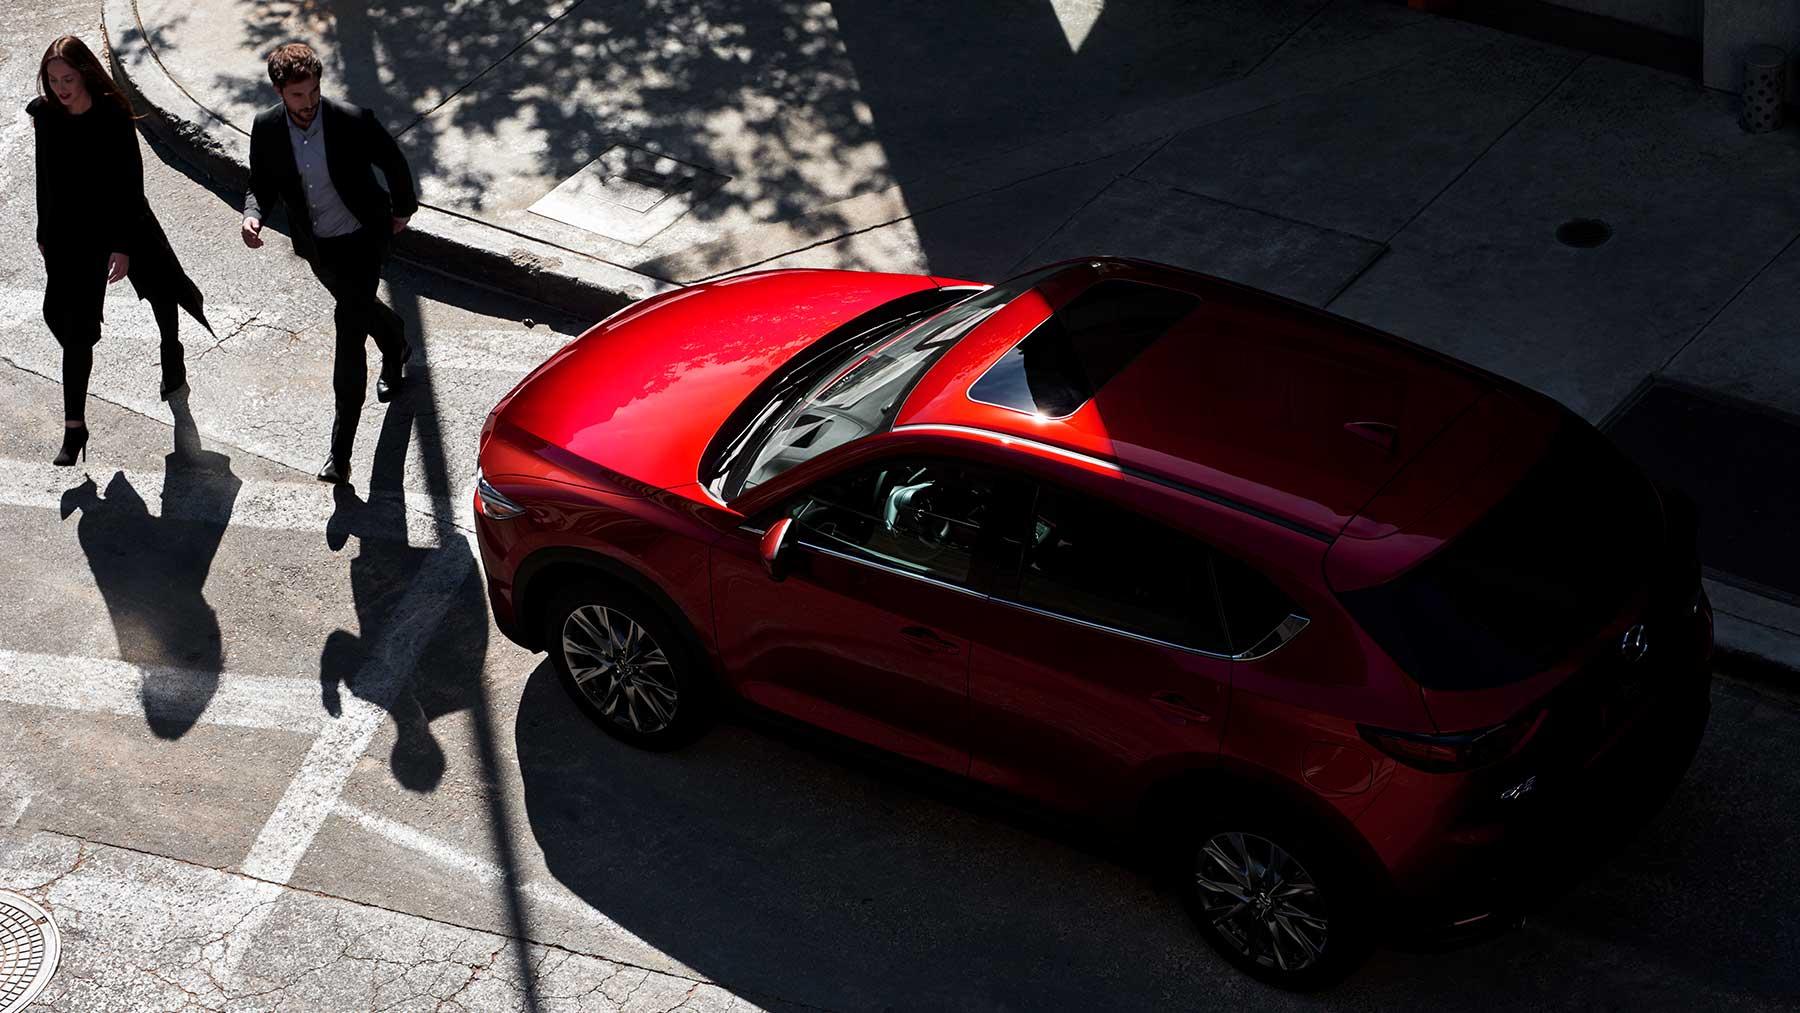 2019 Mazda CX-5 Leasing near Mesa, AZ